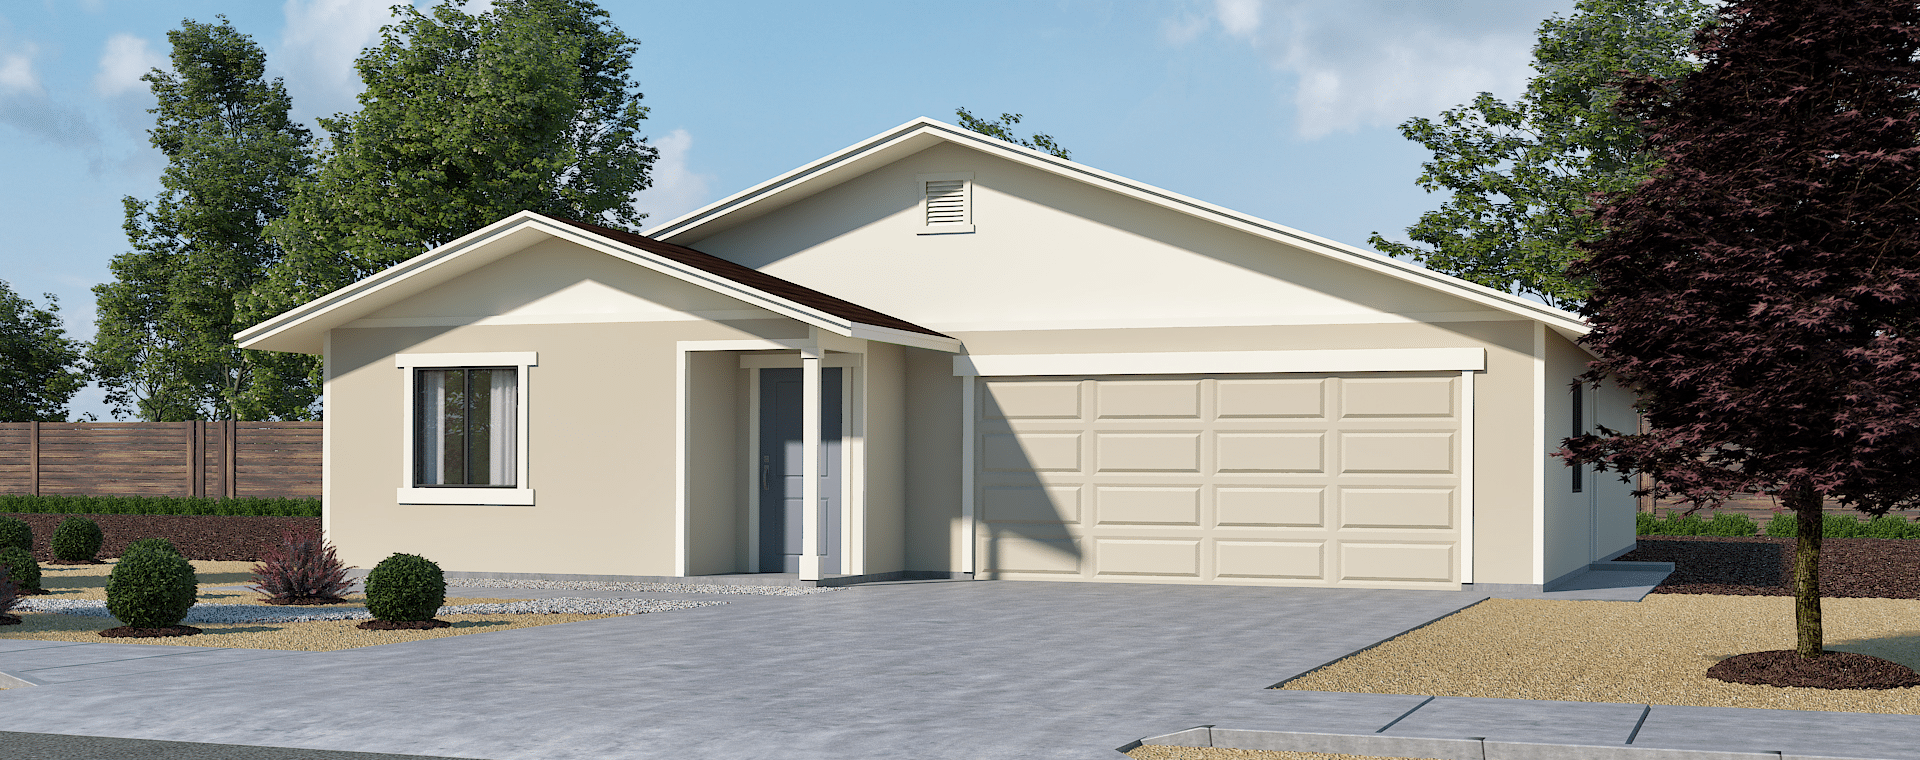 jenuane-communities-new-homes-nv-flats-plan-5-1441